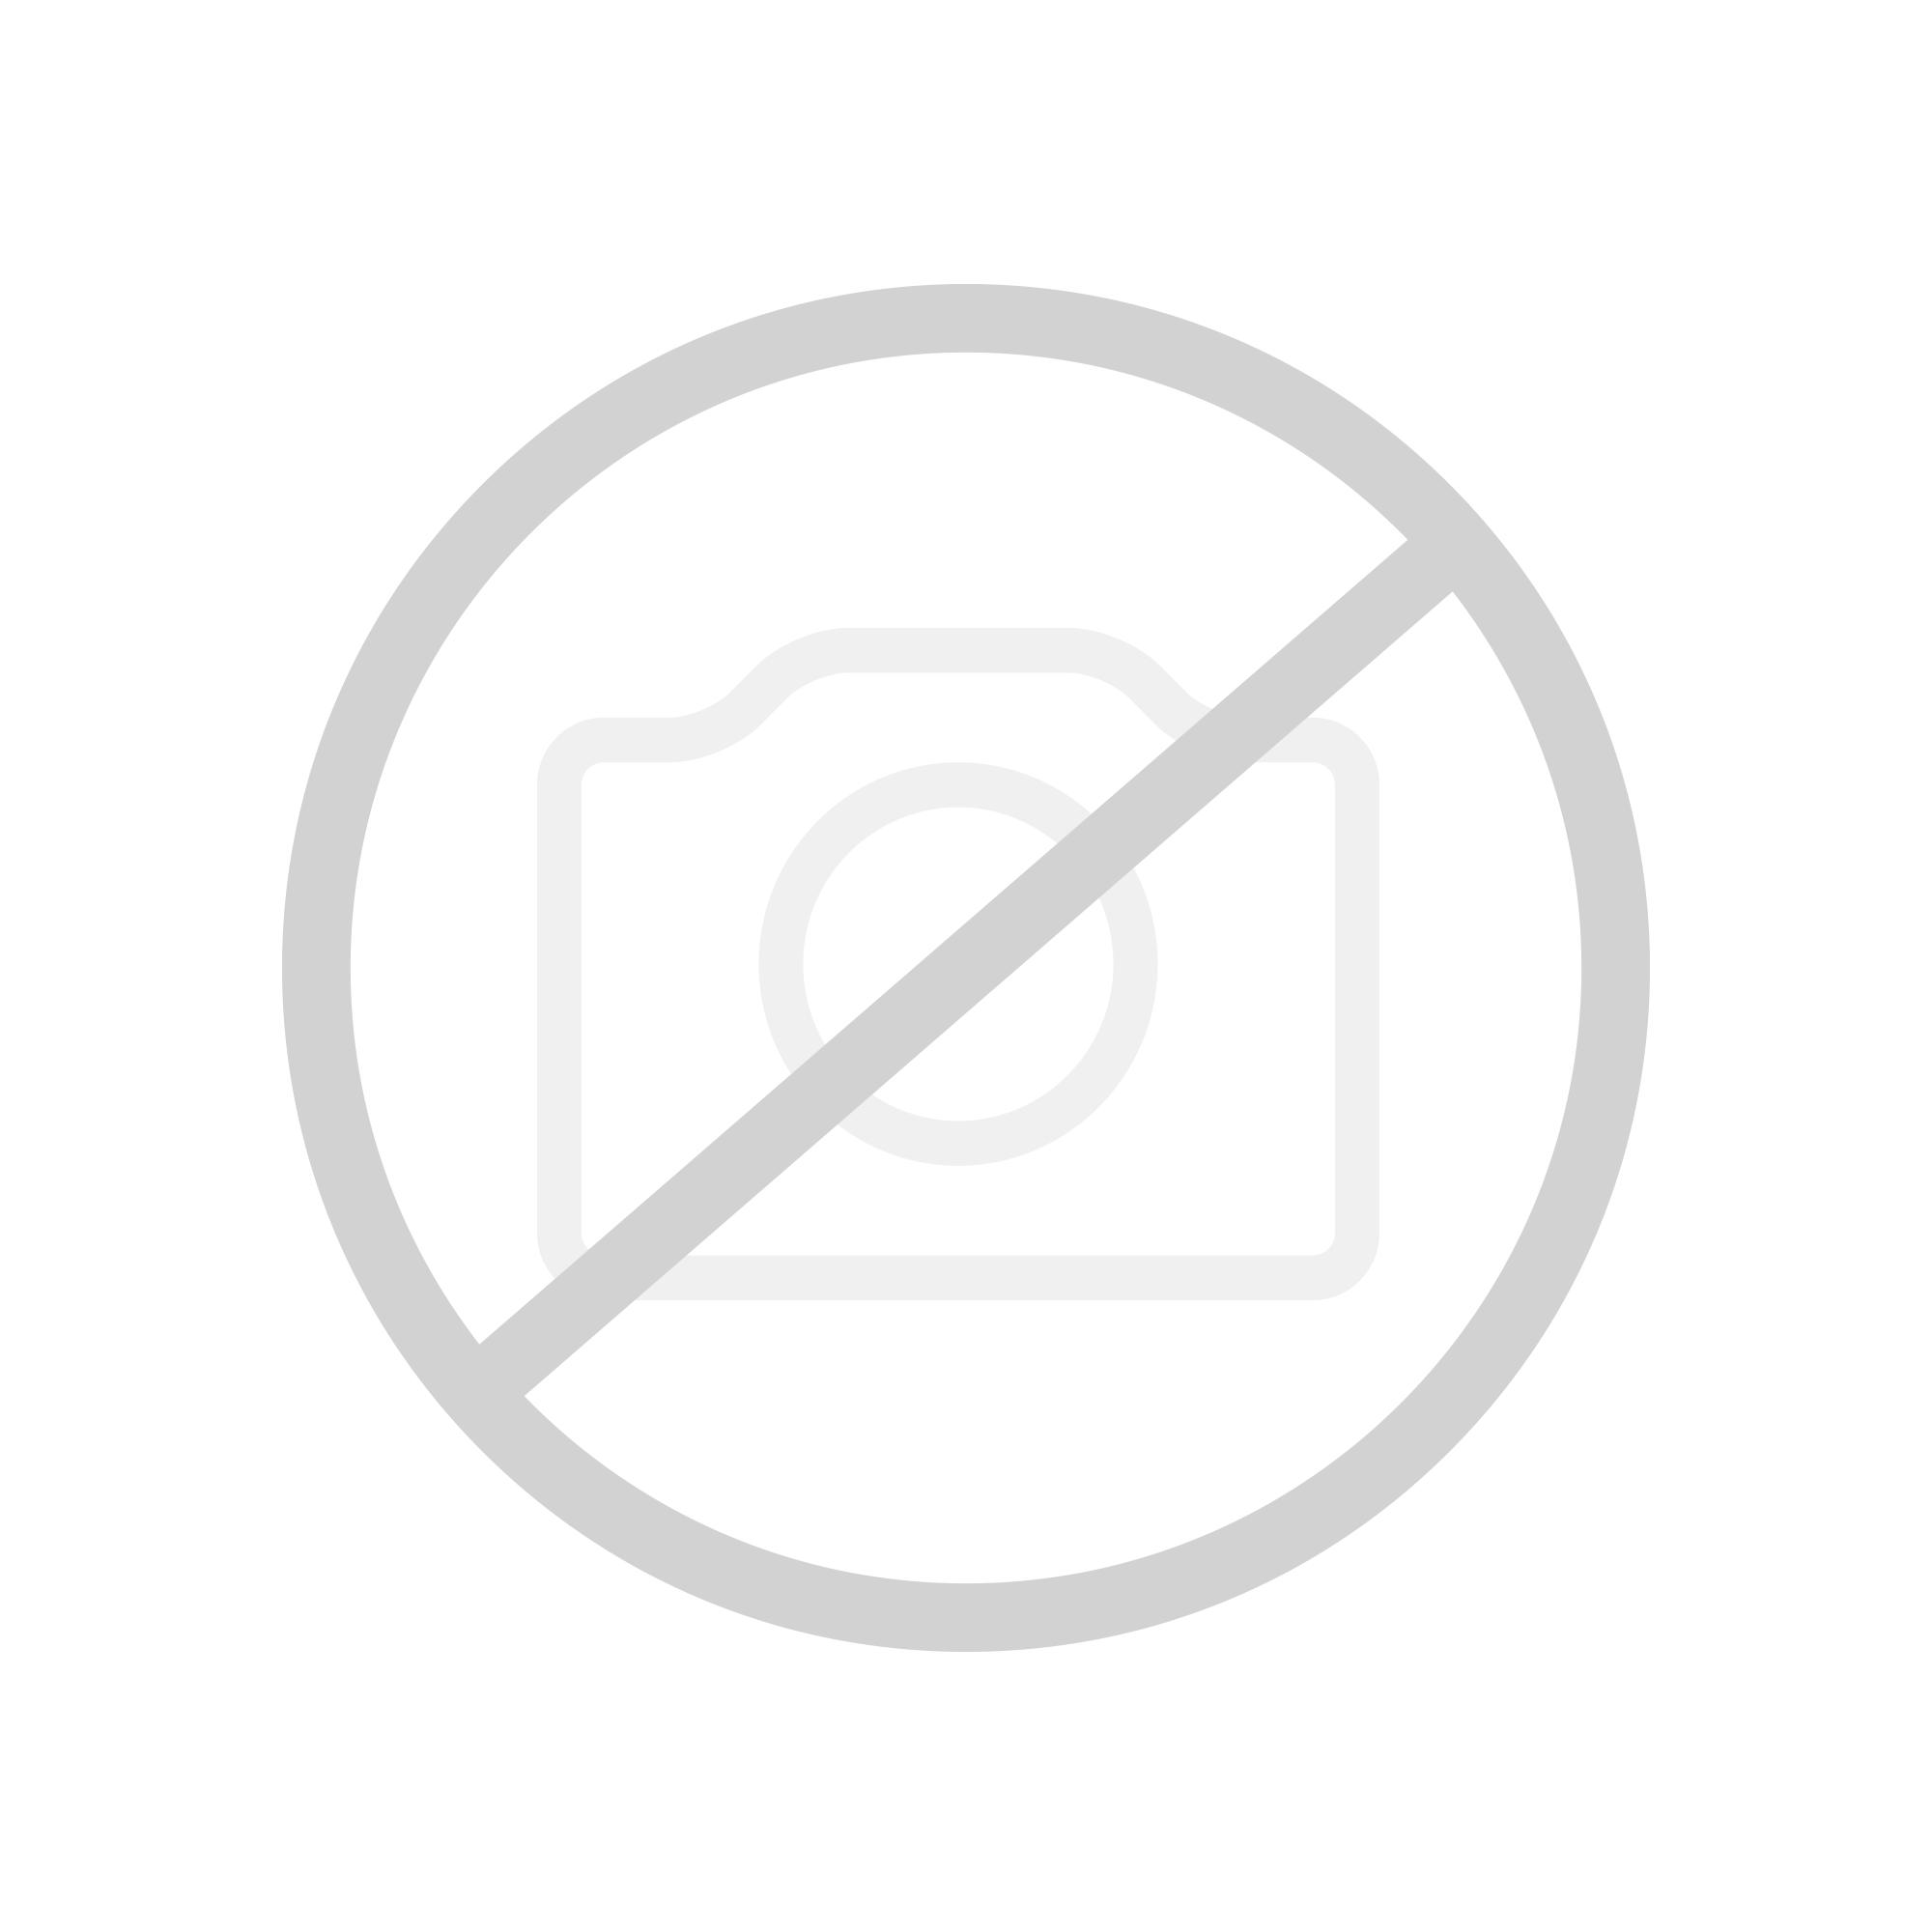 Tellkamp Neon freistehende Oval Badewanne